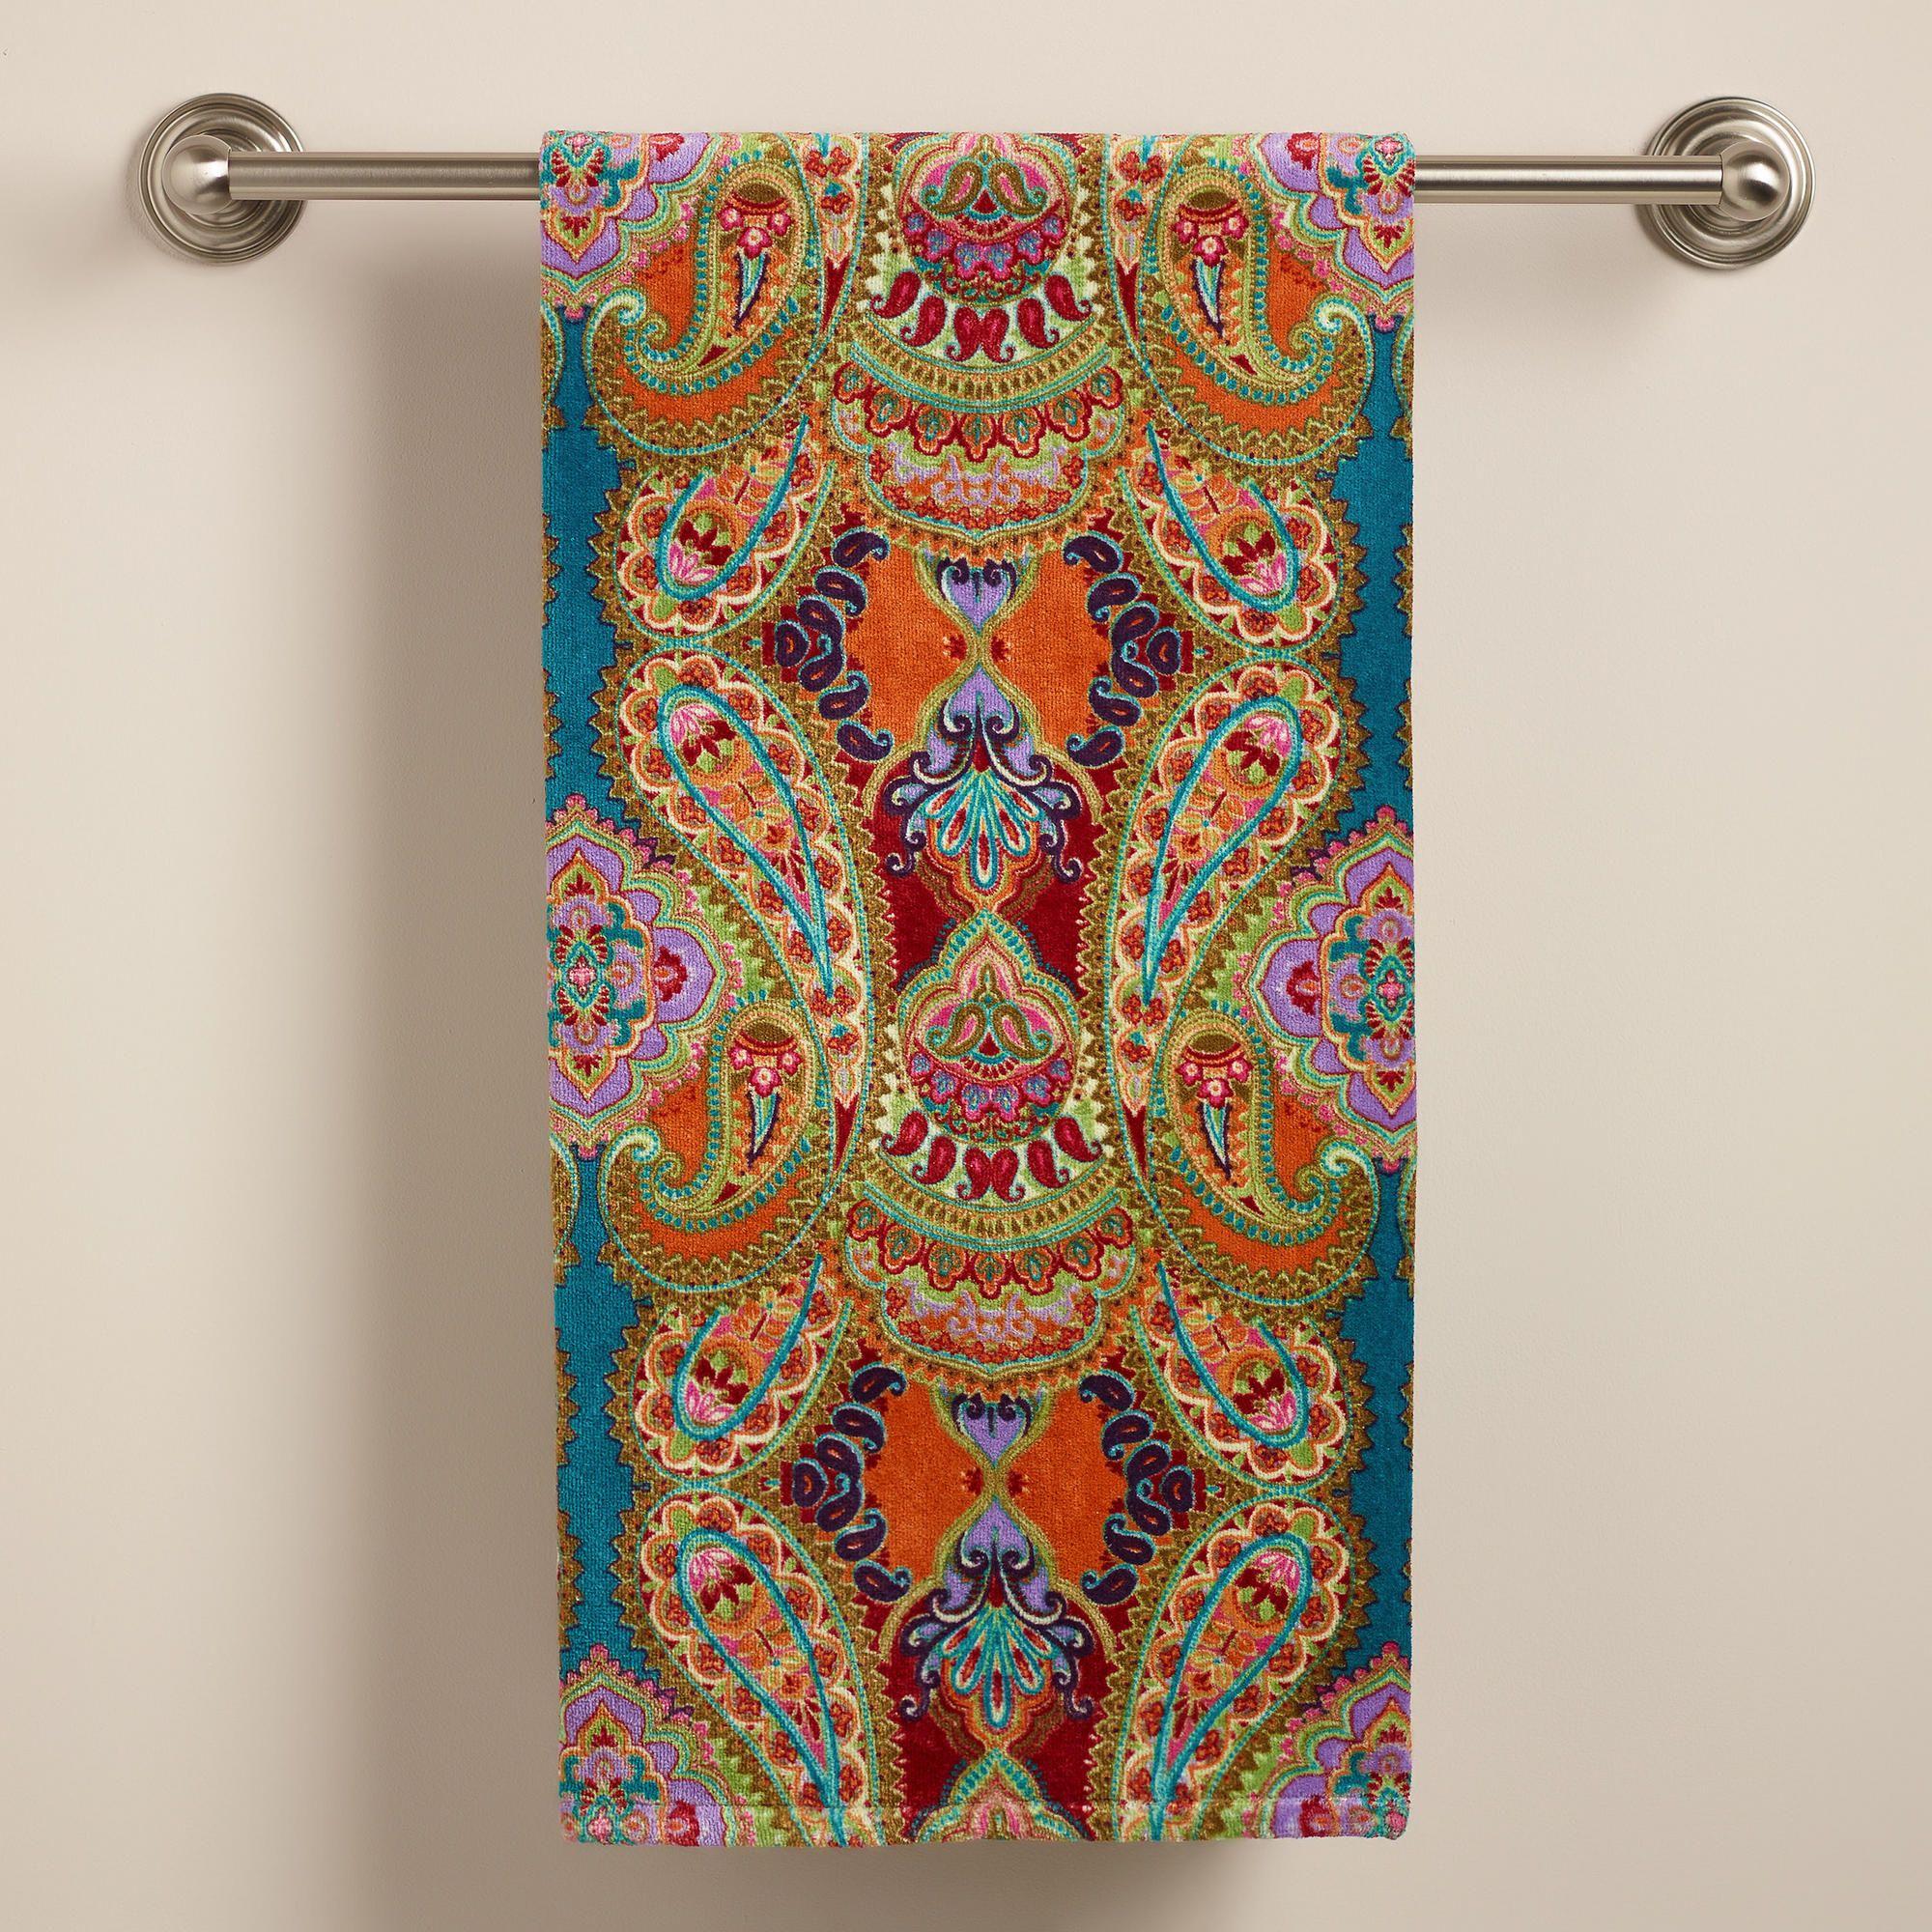 Venice Printed Bath Towel World Market For Our Bathroom